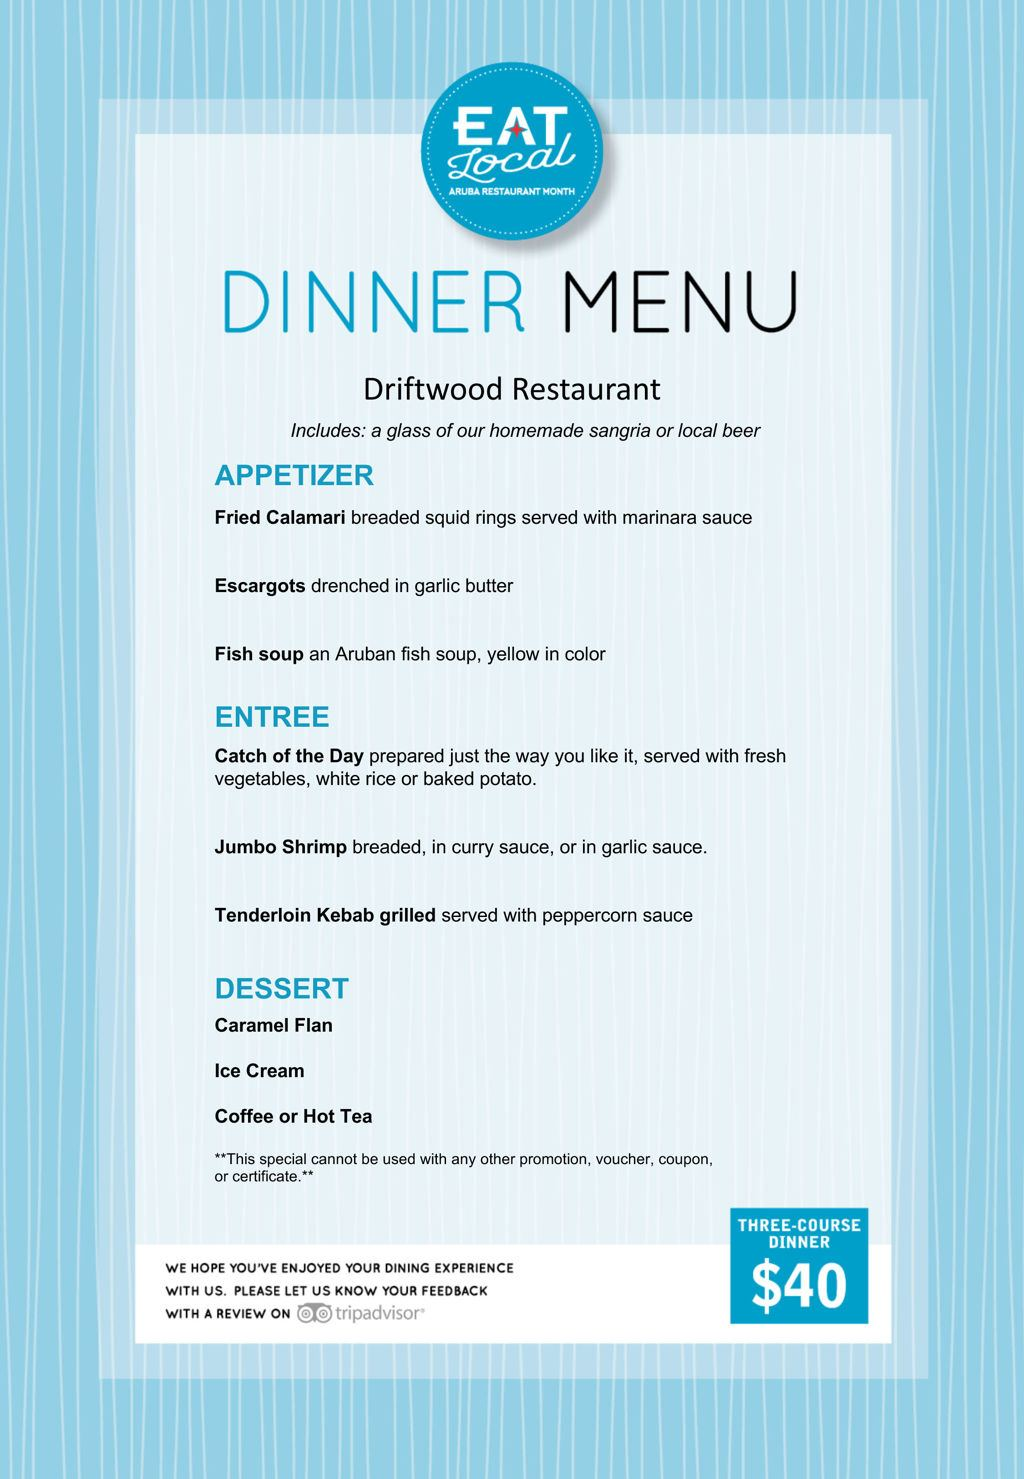 Driftwood Restaurant - Eat Local 2018